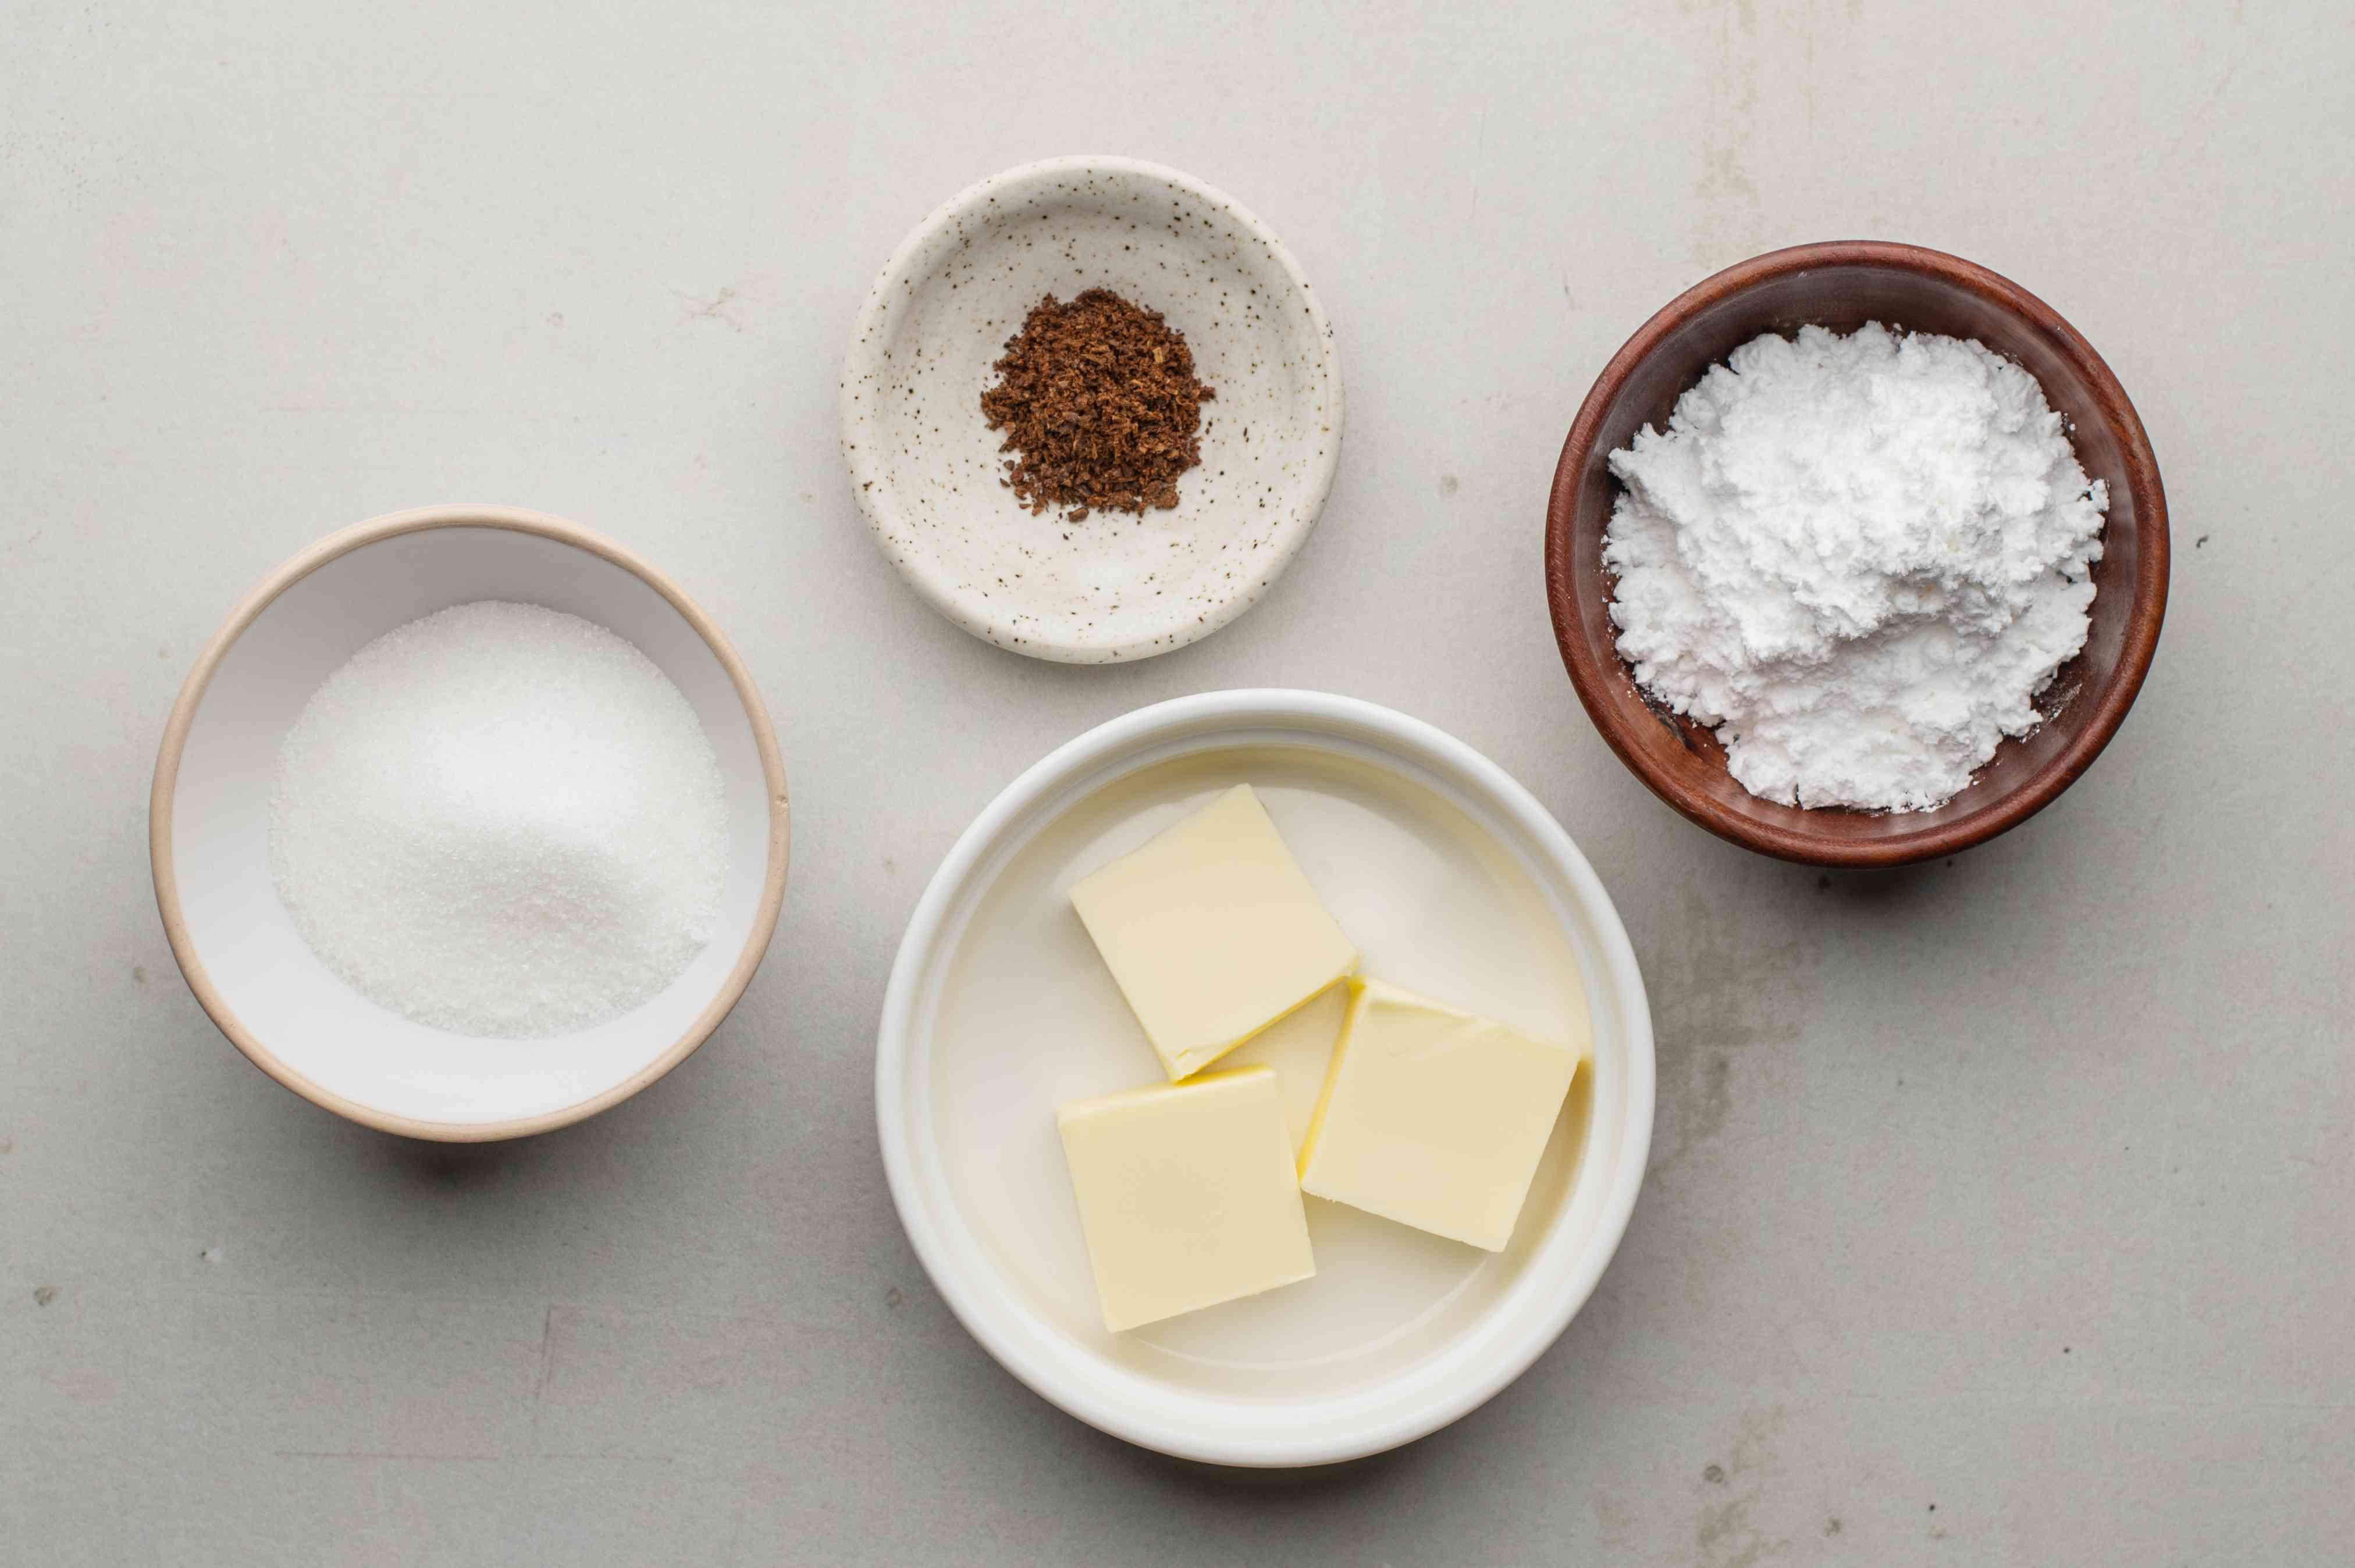 Butter, salt, cocoa, and flour